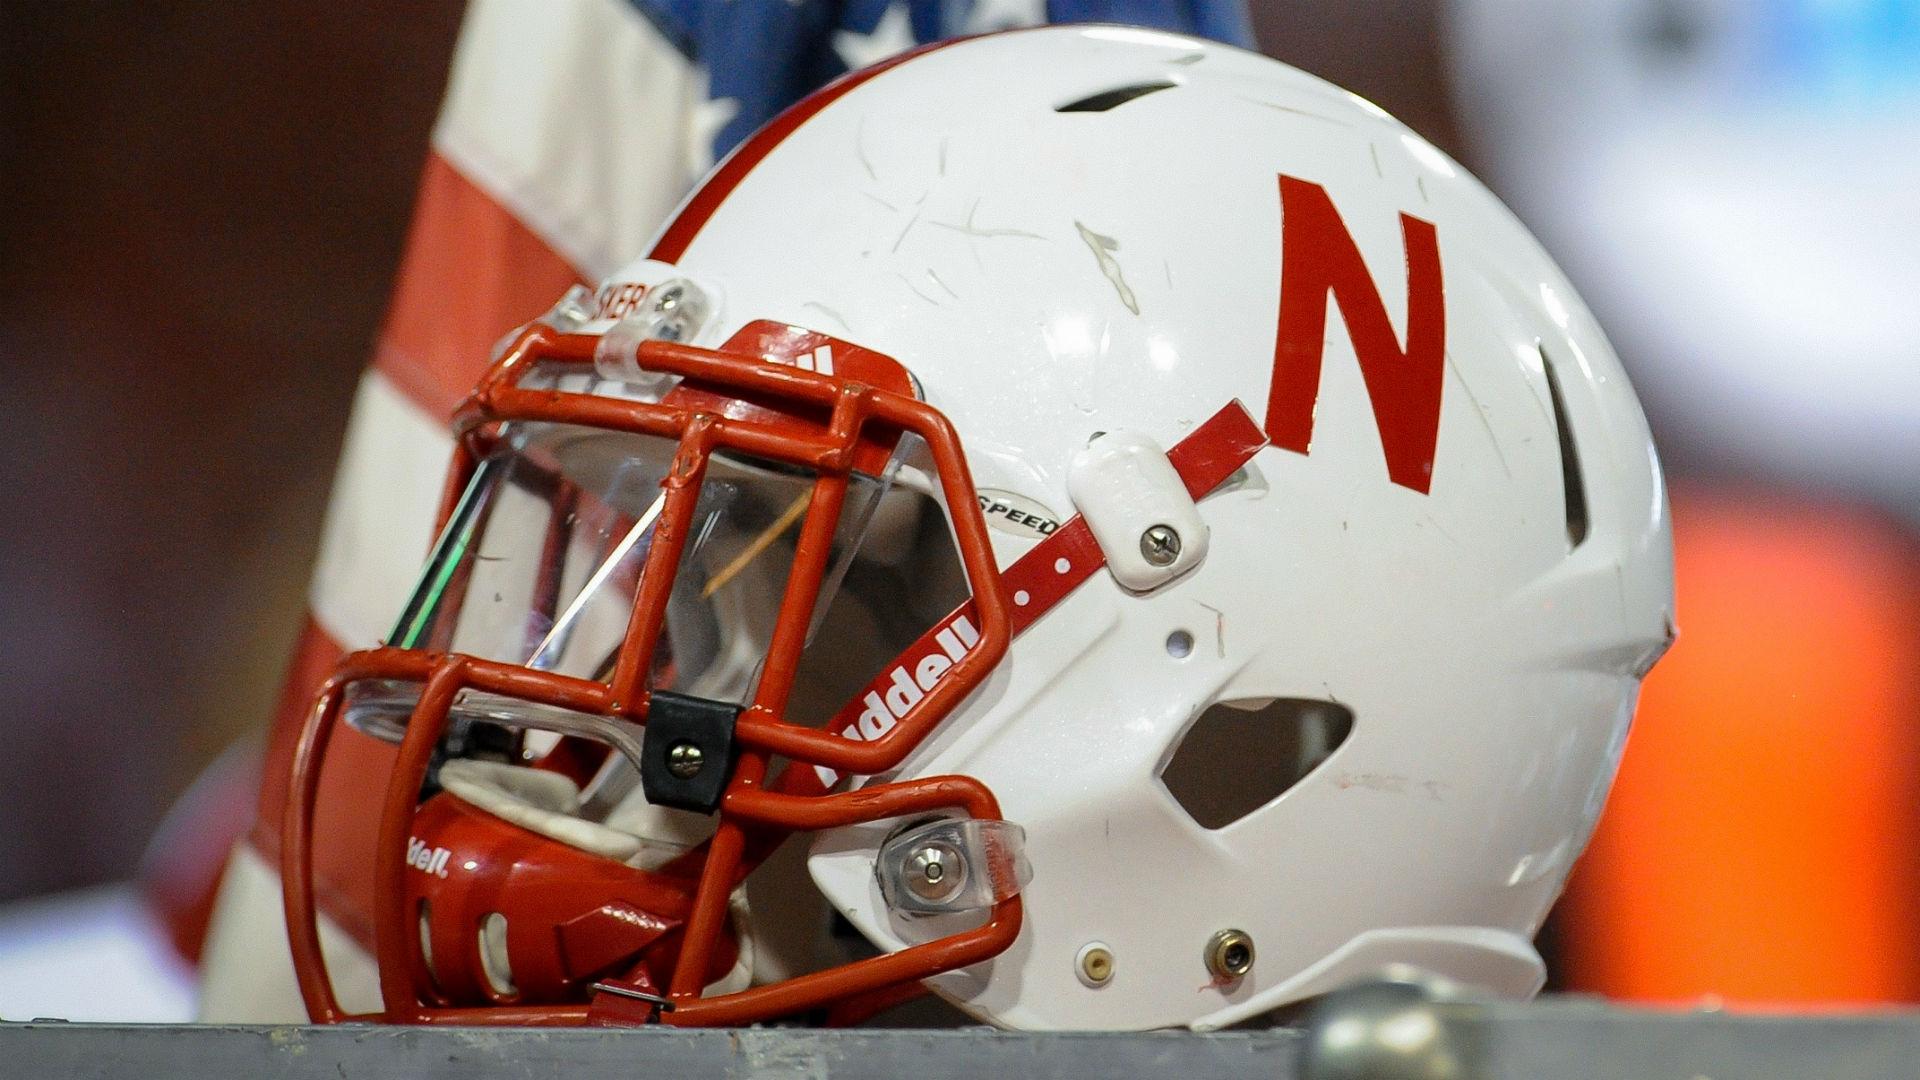 Keyshawn Johnson Jr. announces decision to transfer from Nebraska